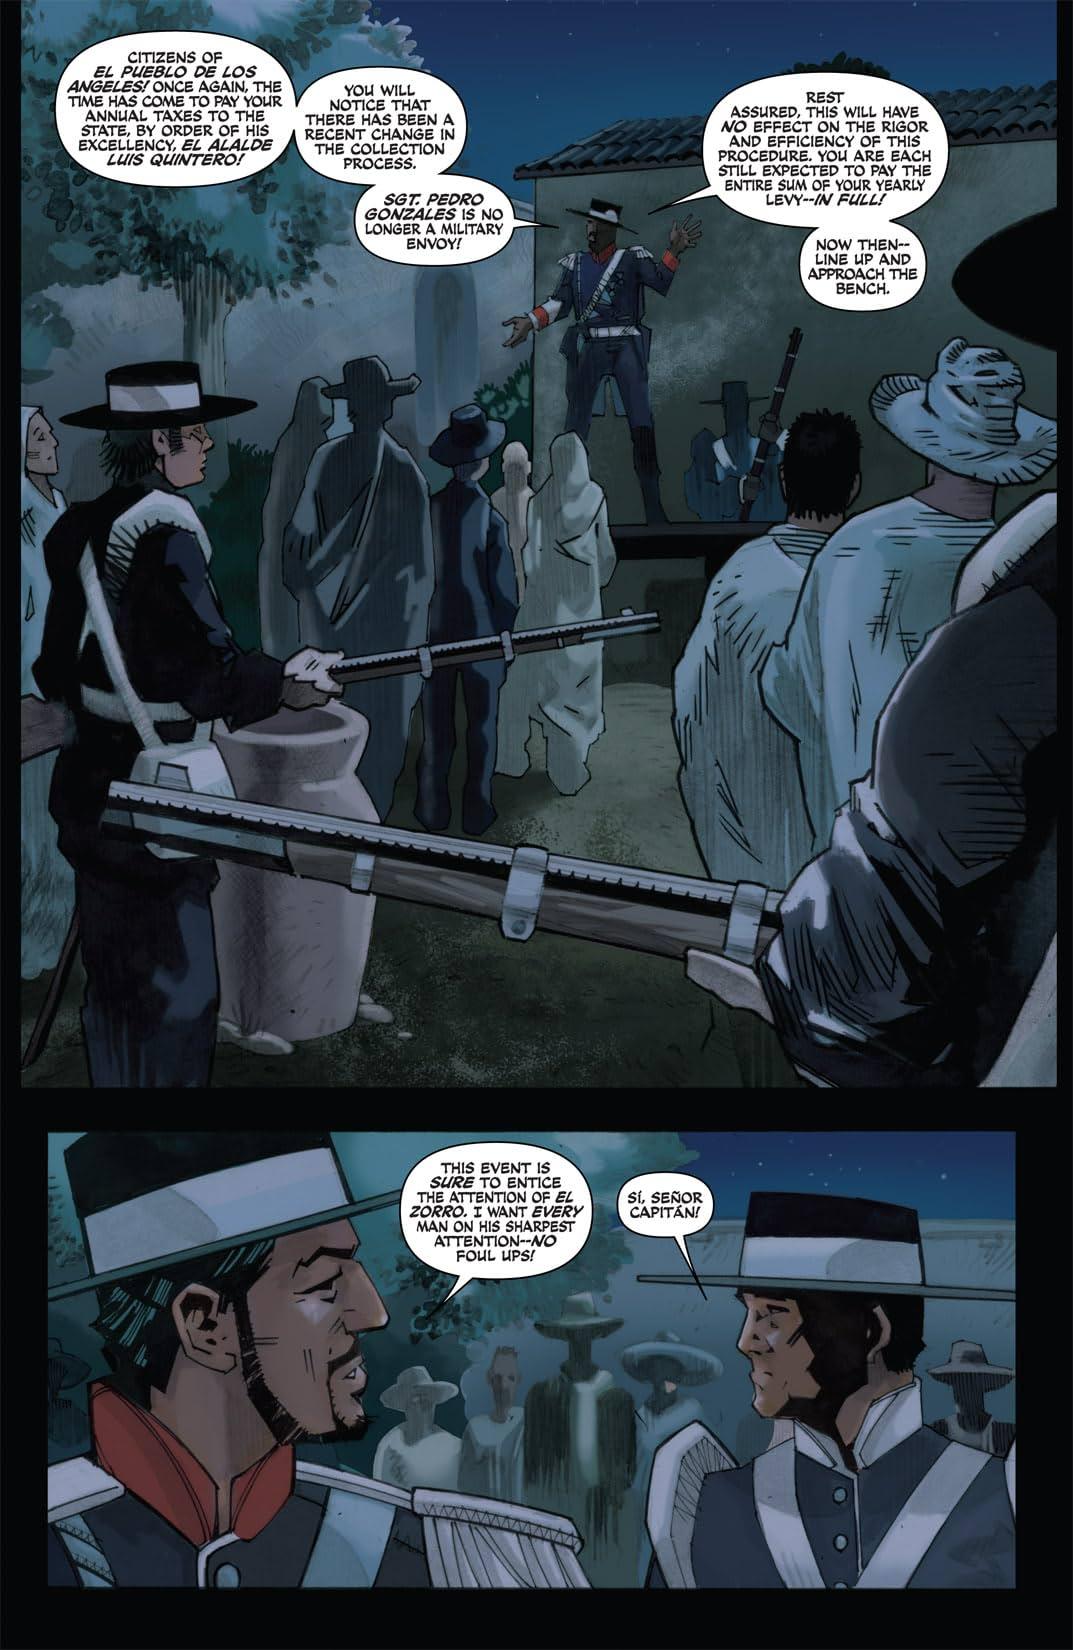 Zorro Rides Again #8 (of 12)